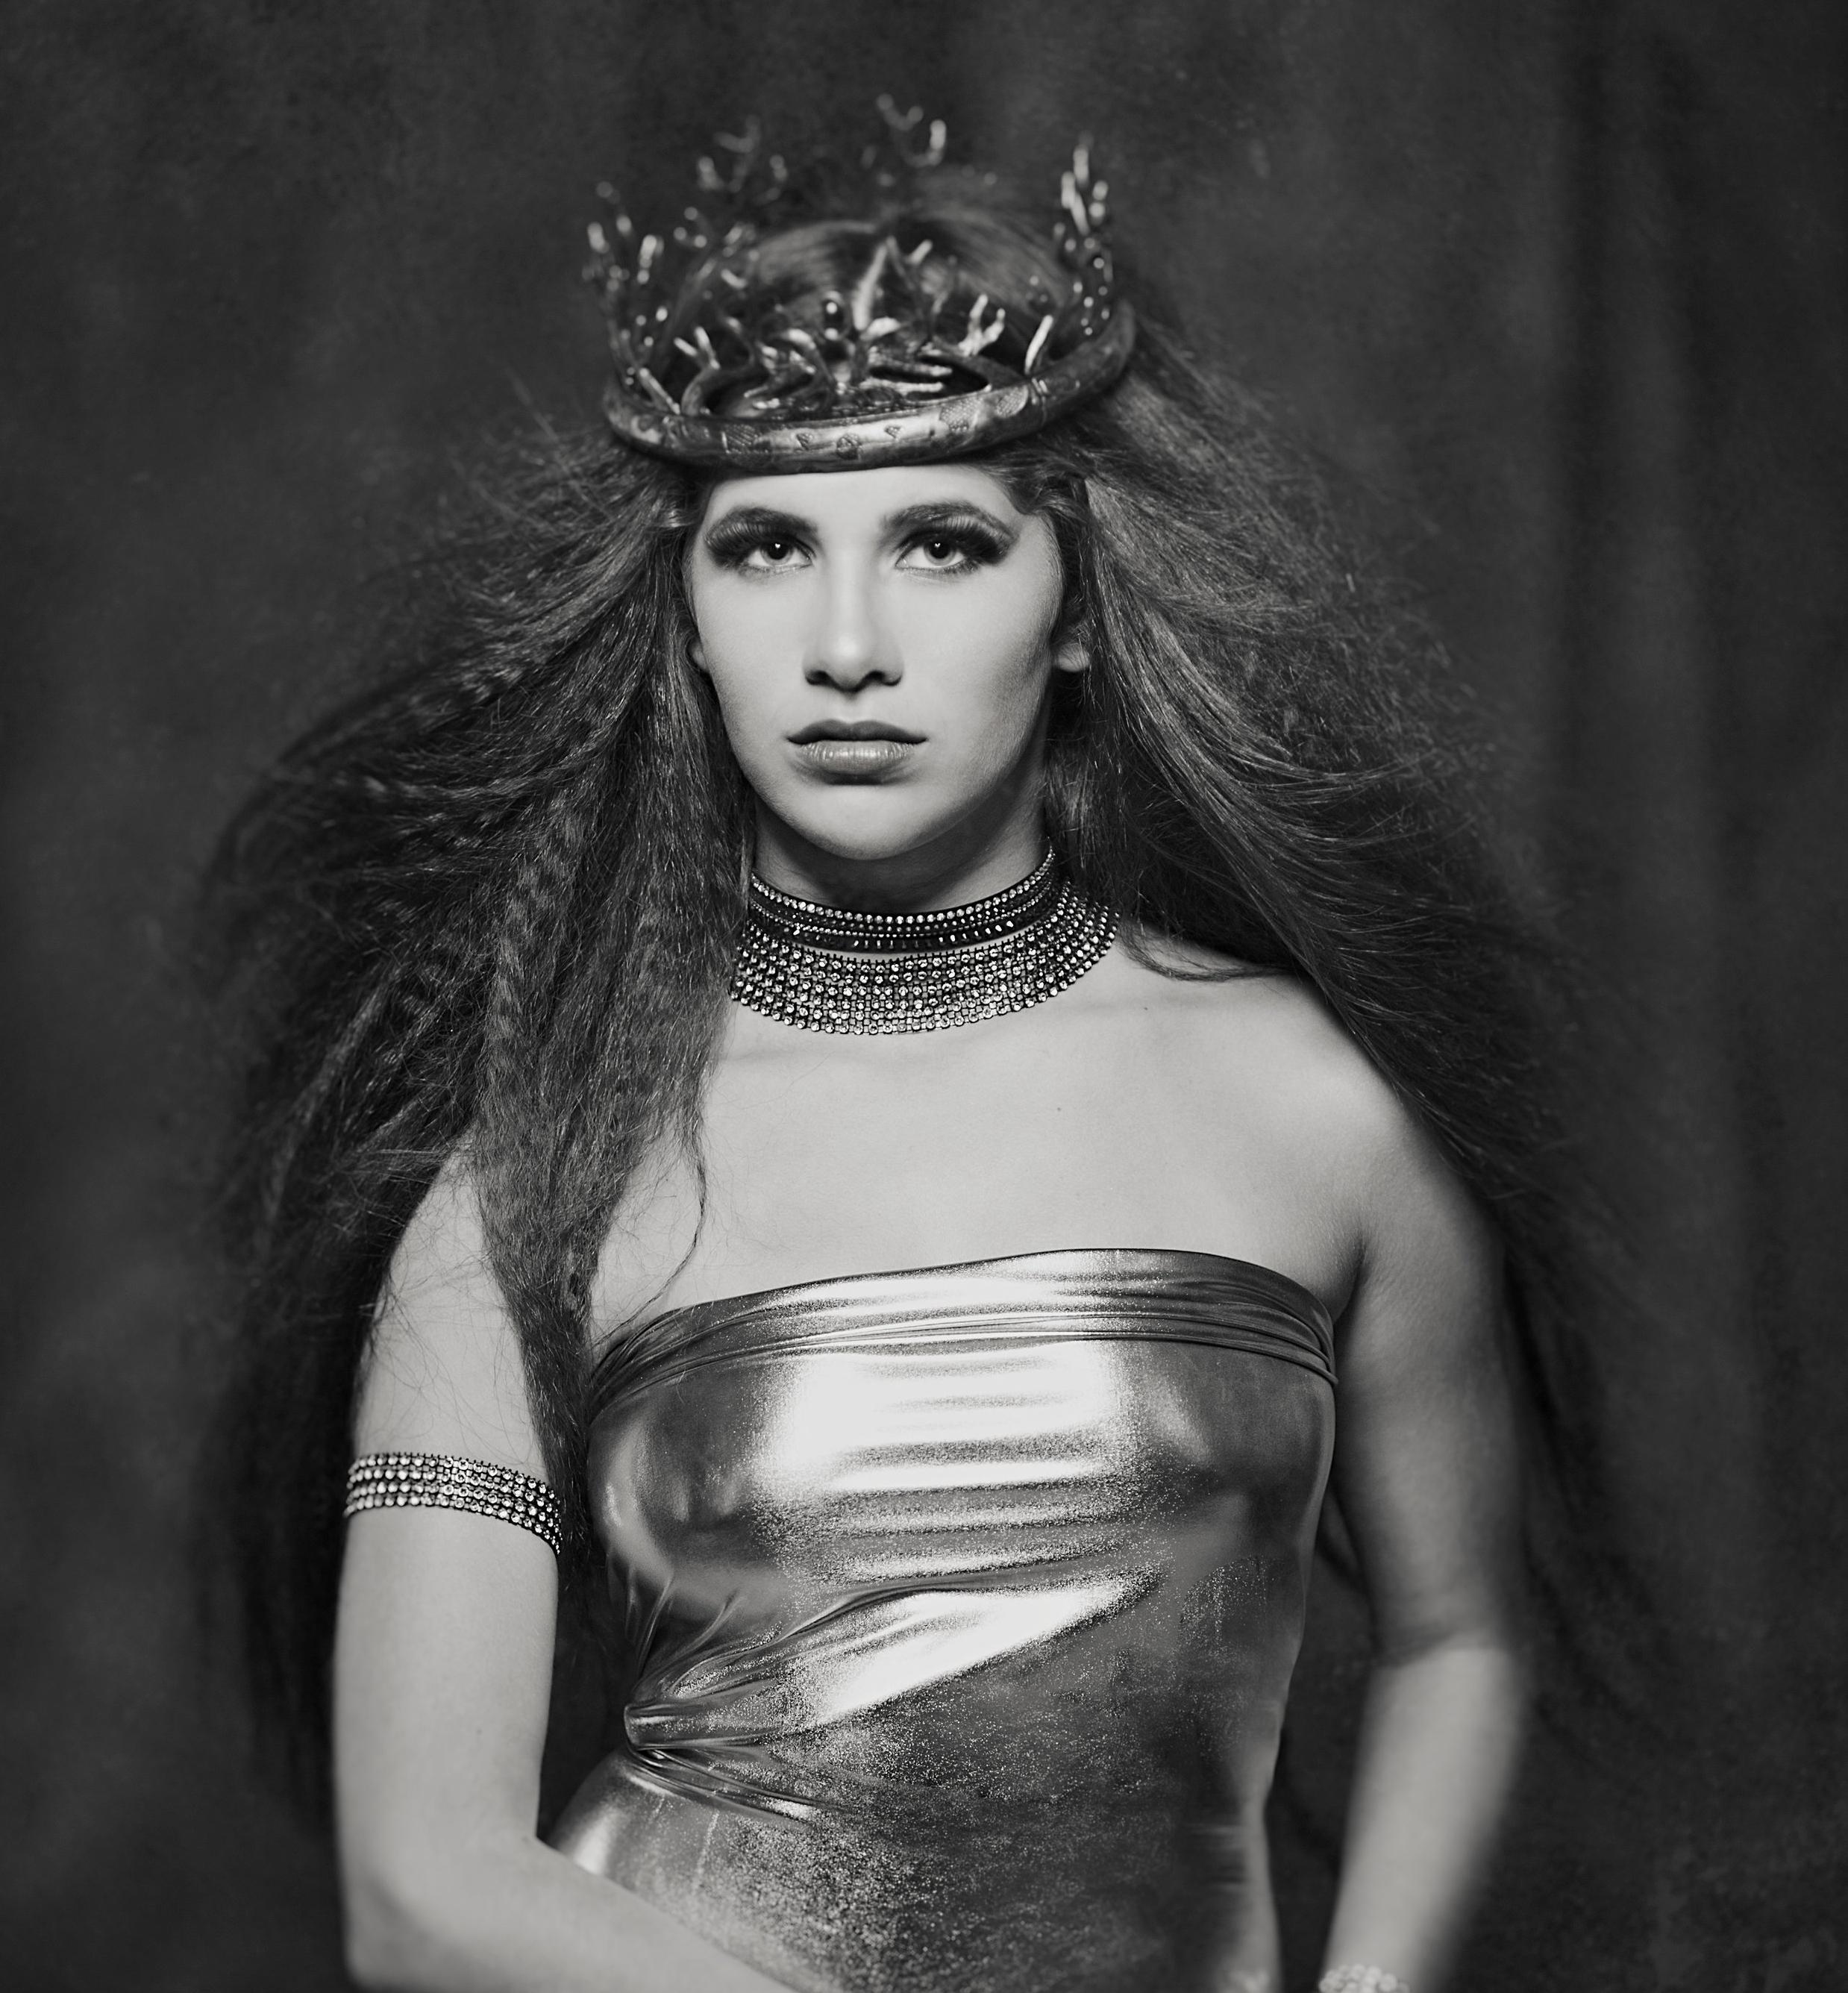 Themed-Portraits-Marta-Hewson-Queen.jpg